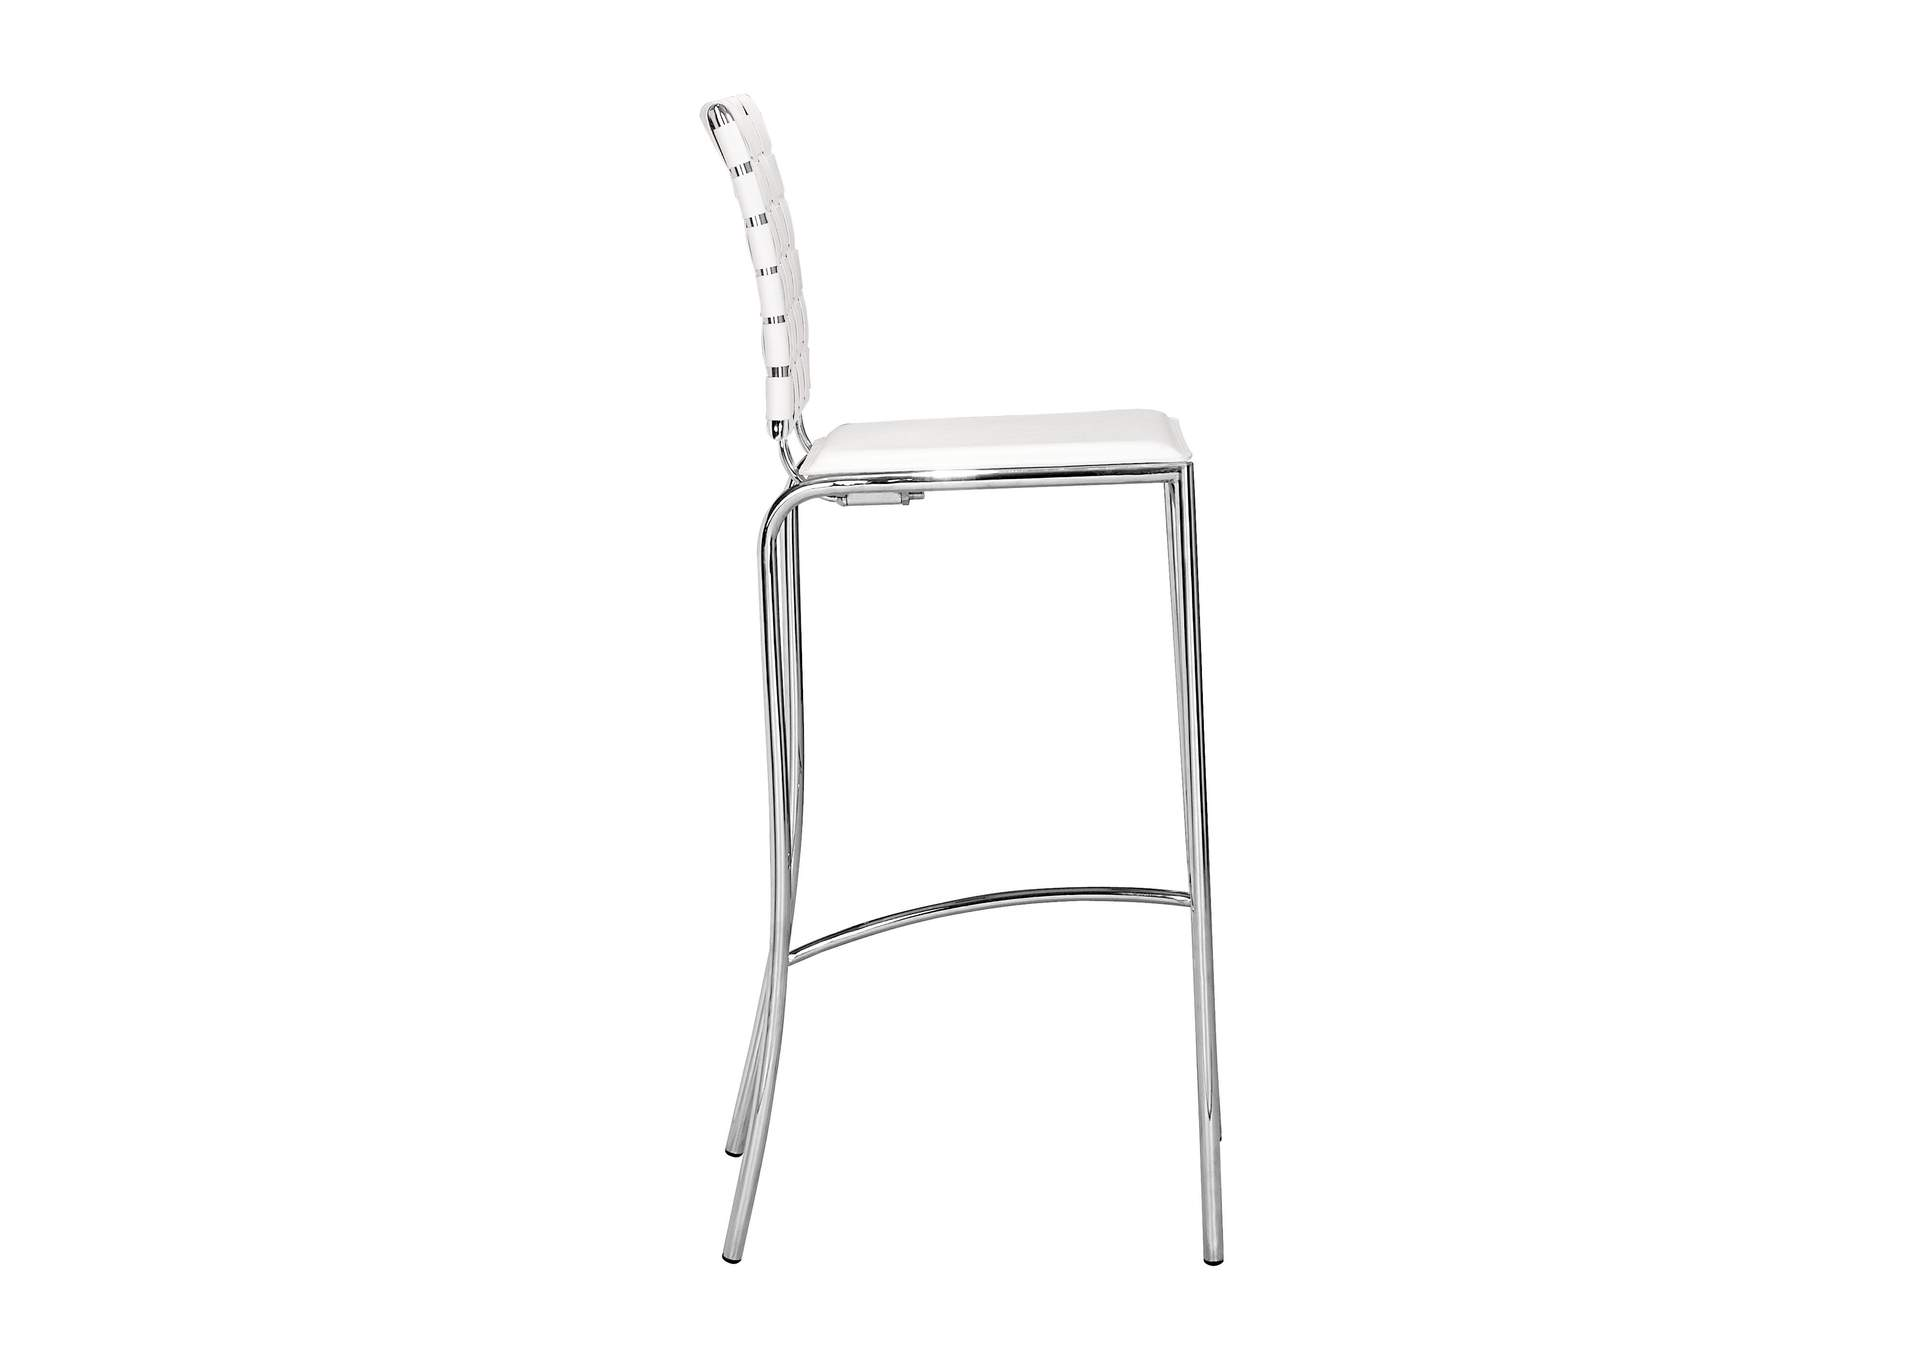 Outstanding Beacon Furniture Grand Cayman Criss Cross Counter Stool Lamtechconsult Wood Chair Design Ideas Lamtechconsultcom